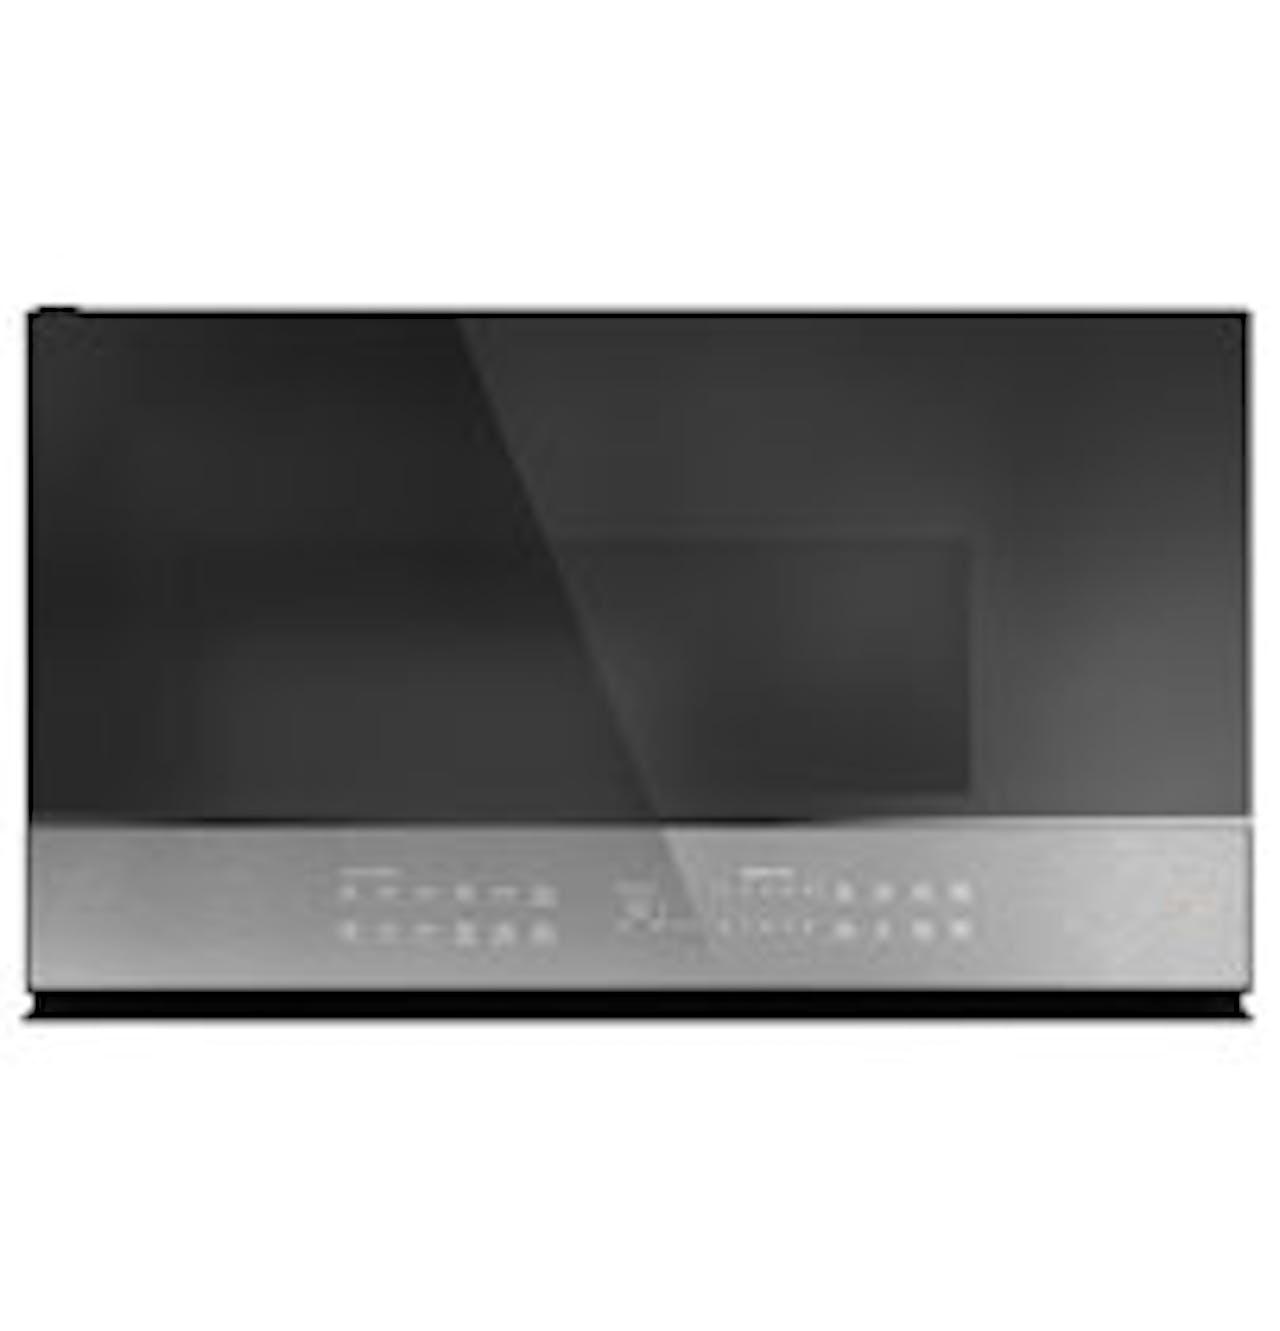 Smart Microwaves